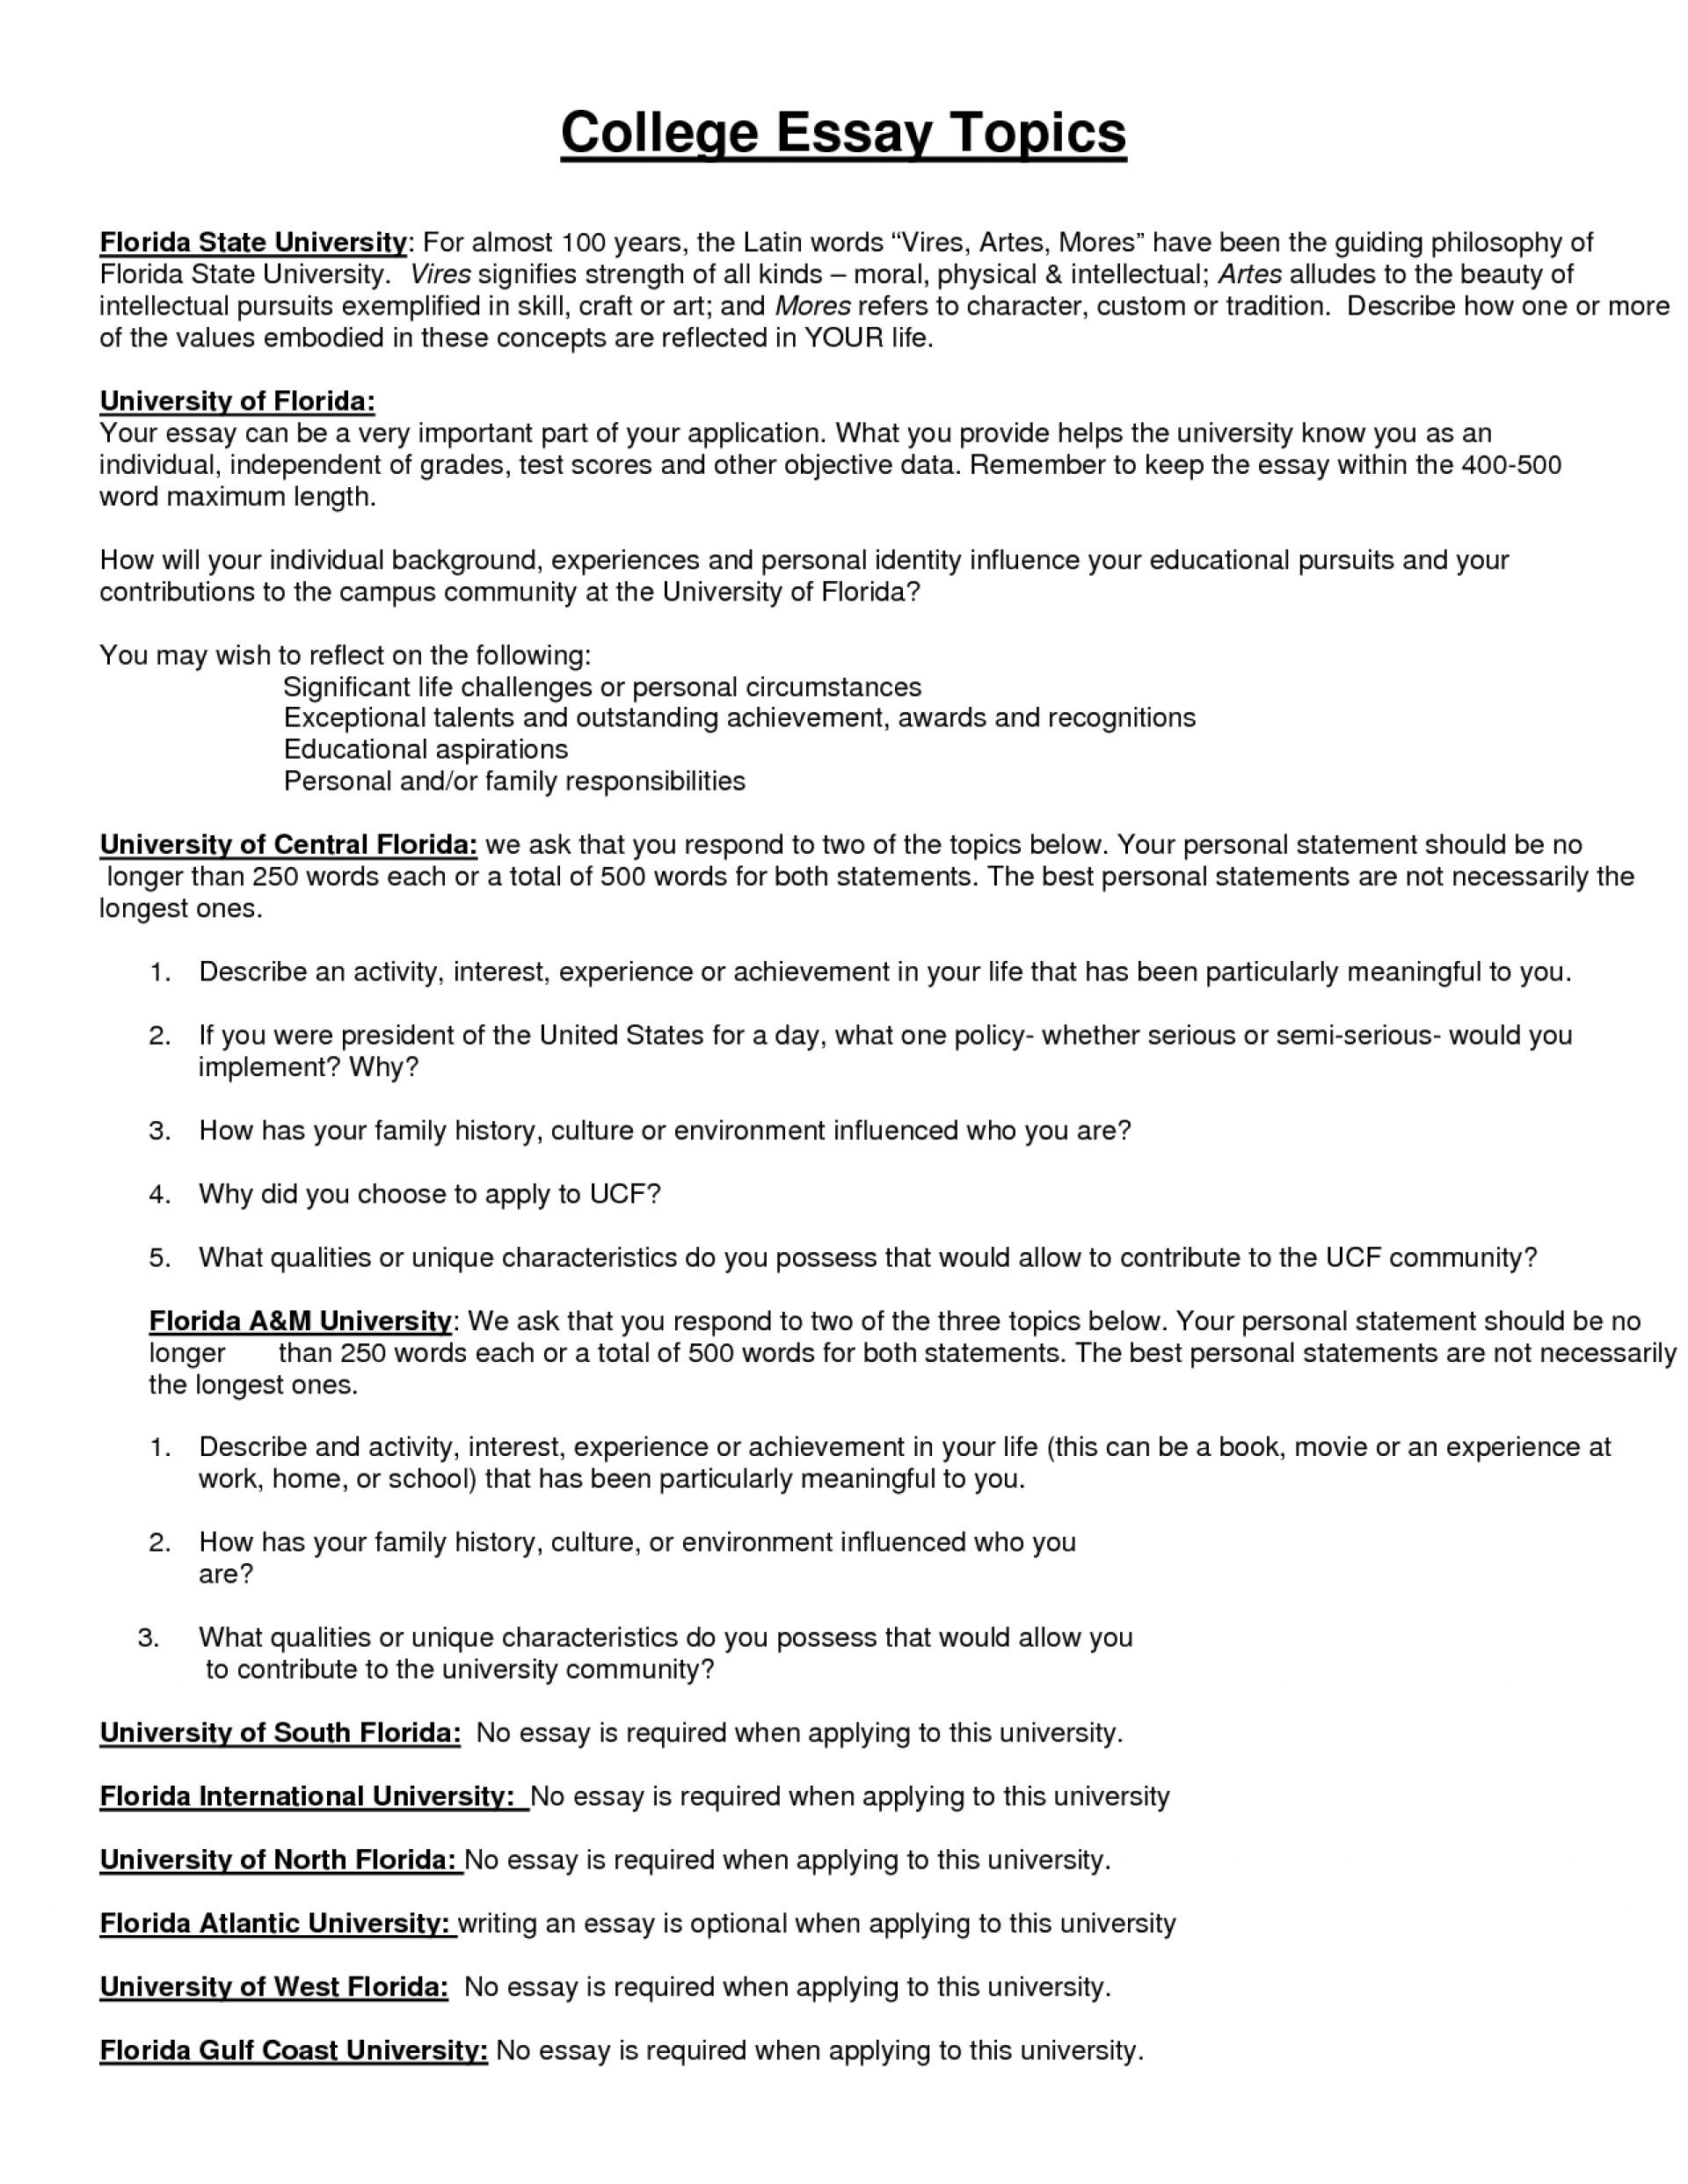 004 Essay Example Khqbtdlt College Writing Prompts Topics Frightening 2017 Boston Harvard Ideas 1920